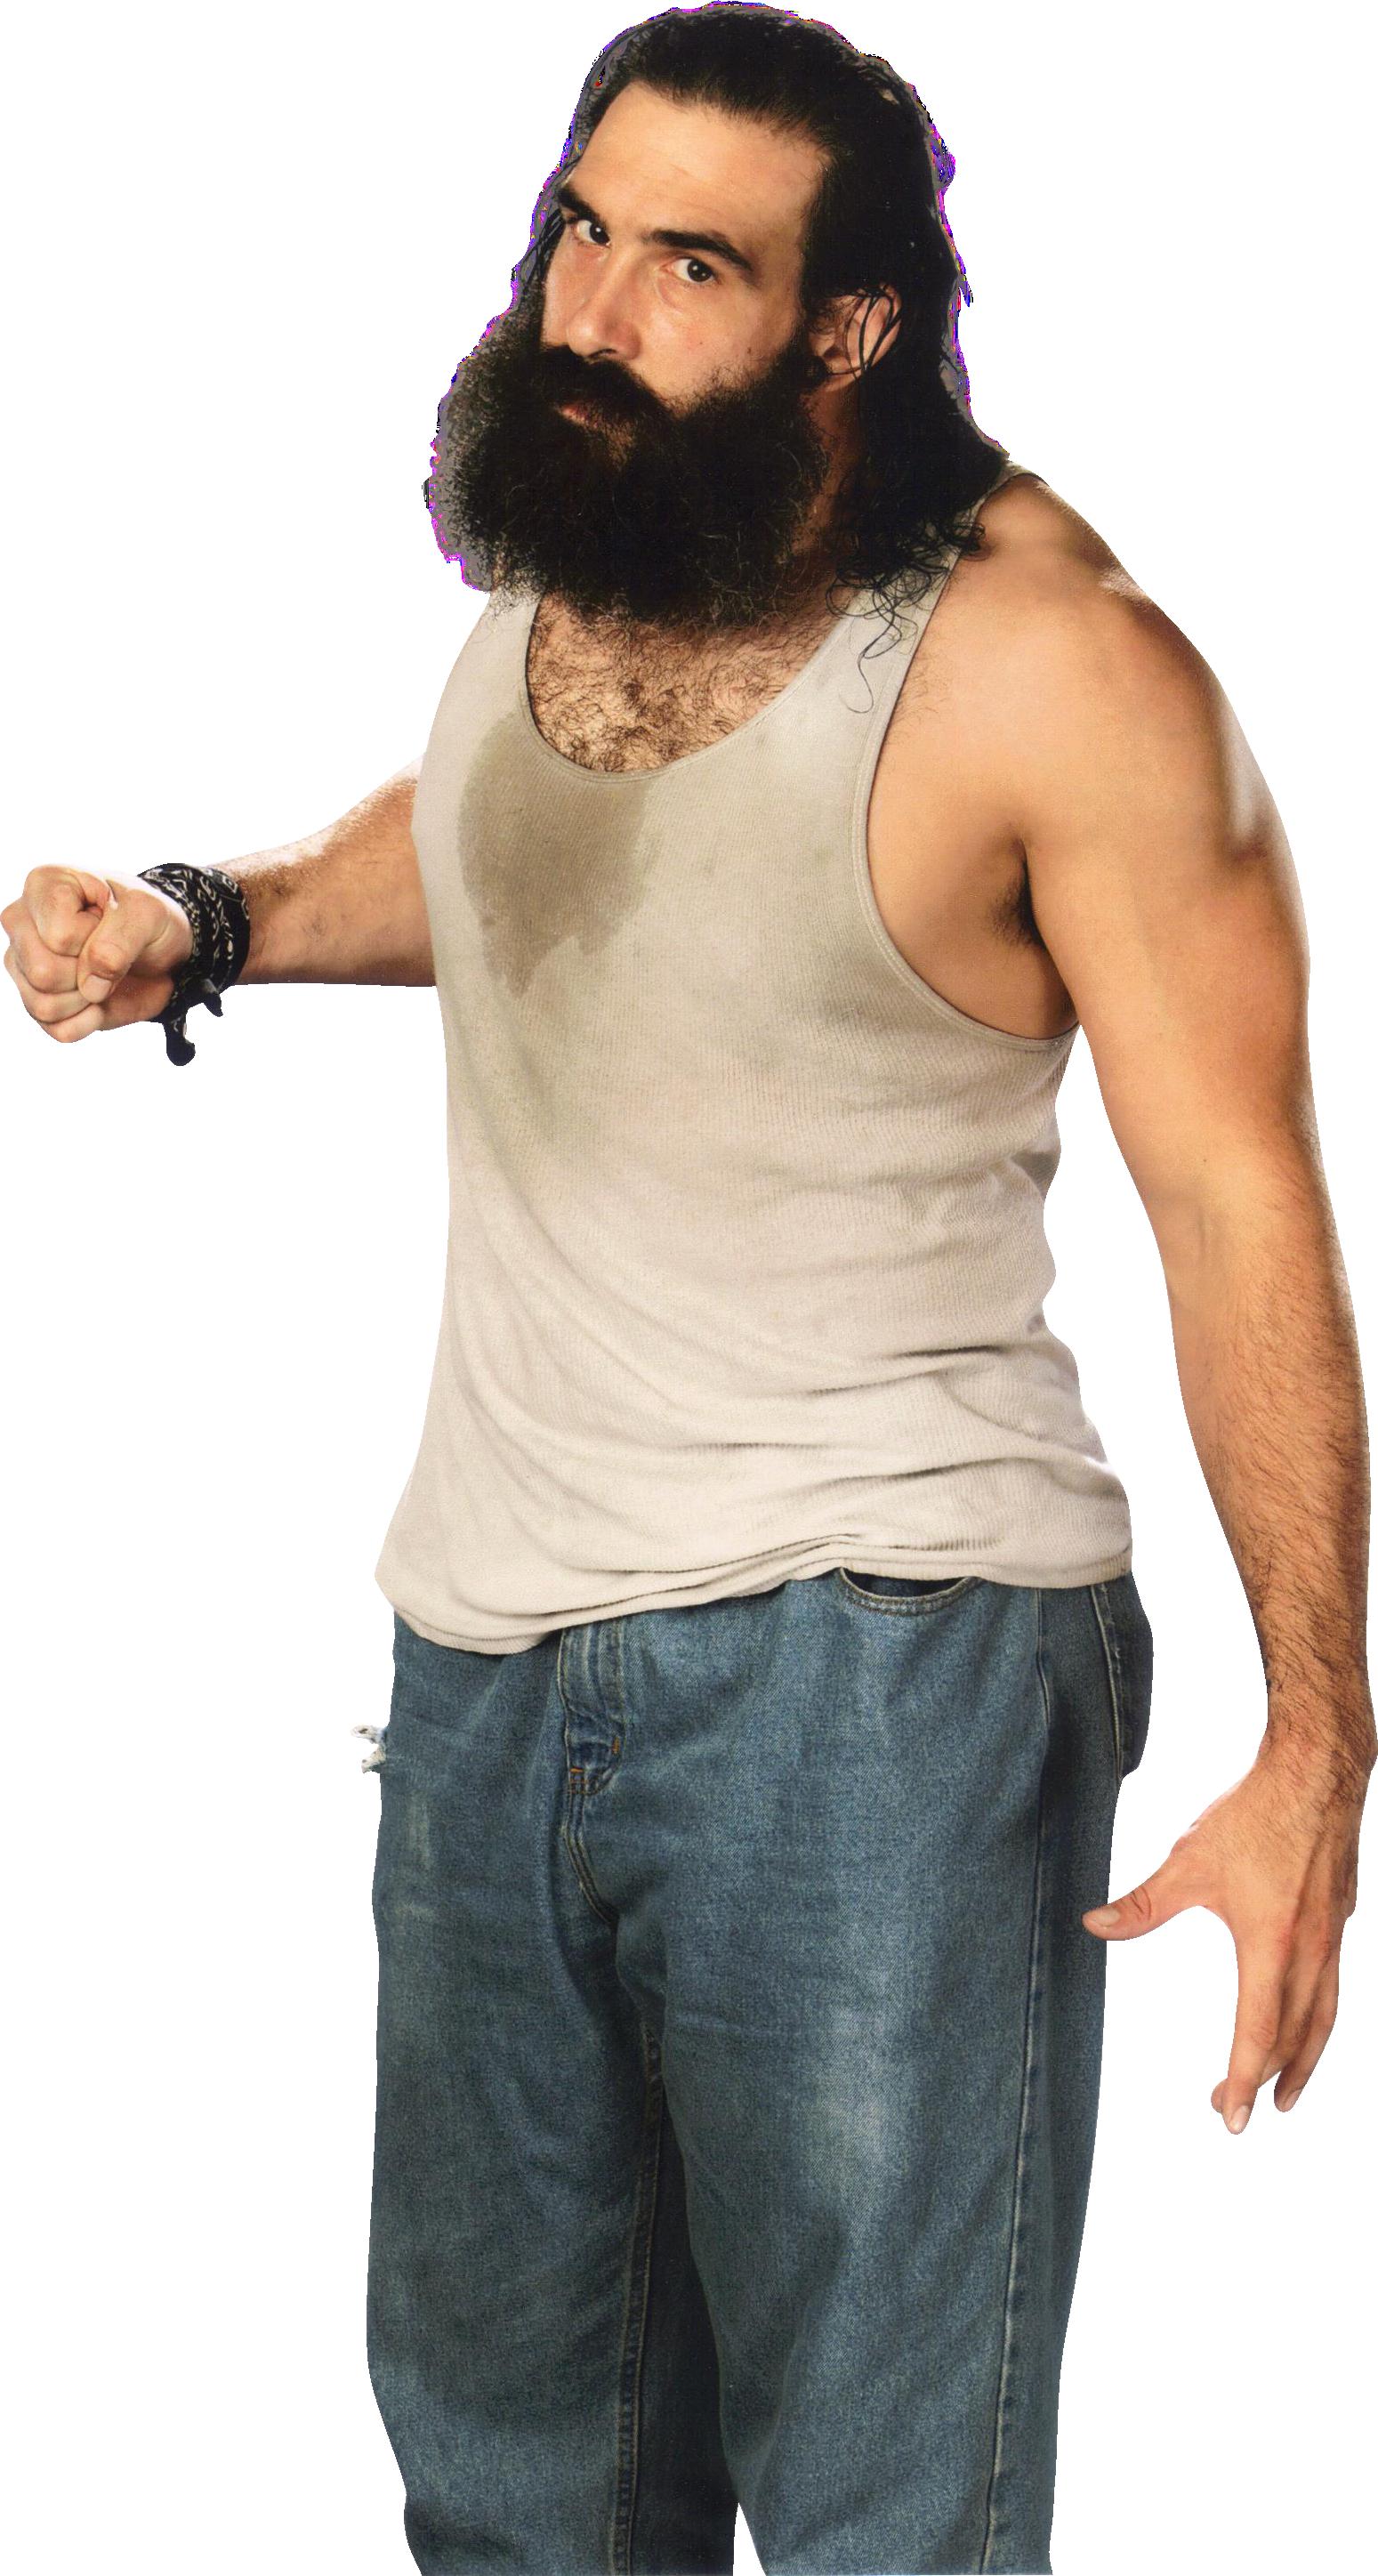 Luke Harper The Wyatt Family Wwe Erick Rowan